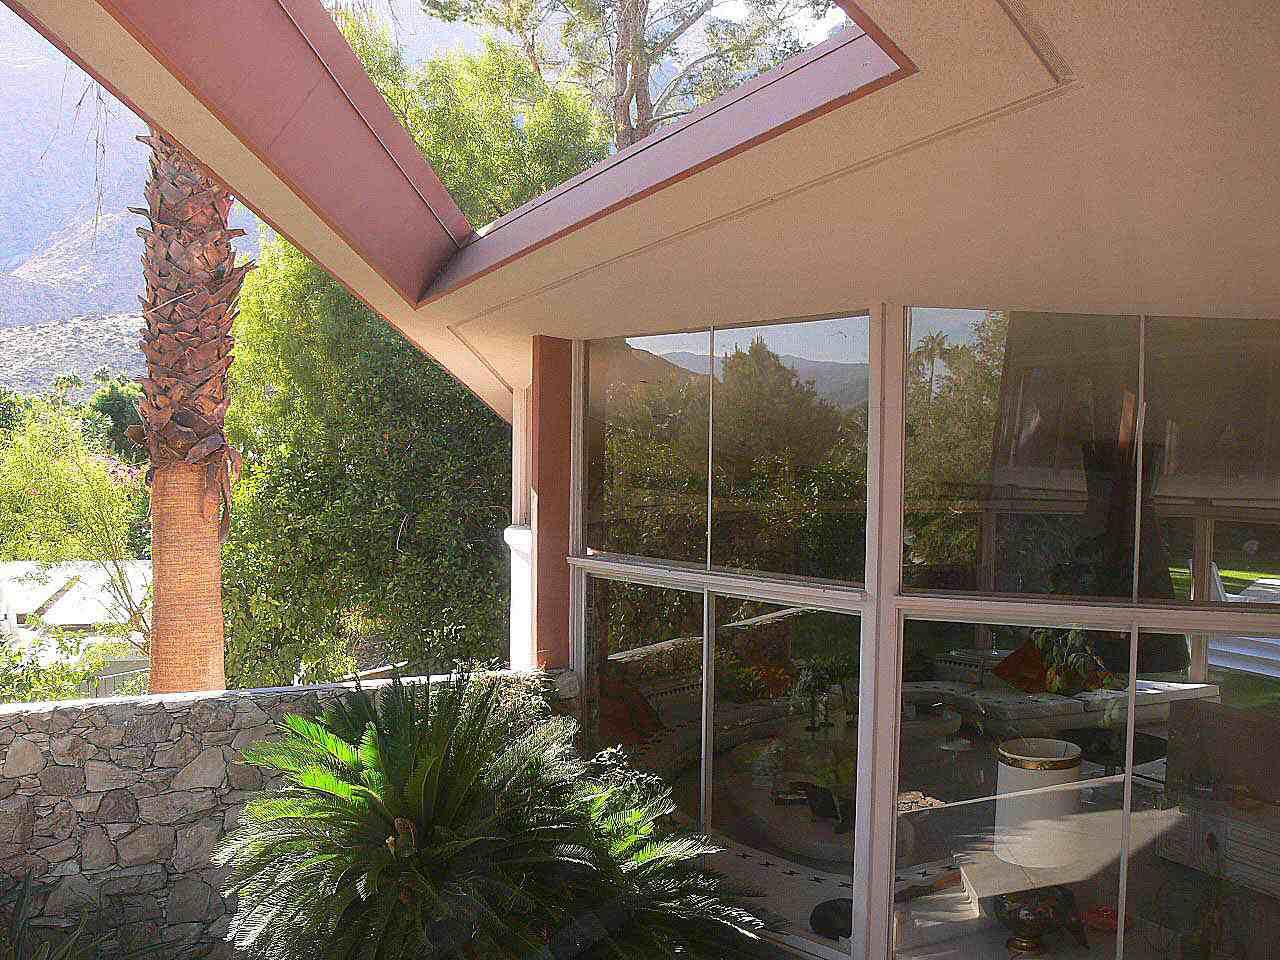 Expansive windows at the Elvis Honeymoon Hideaway in Palm Springs, California